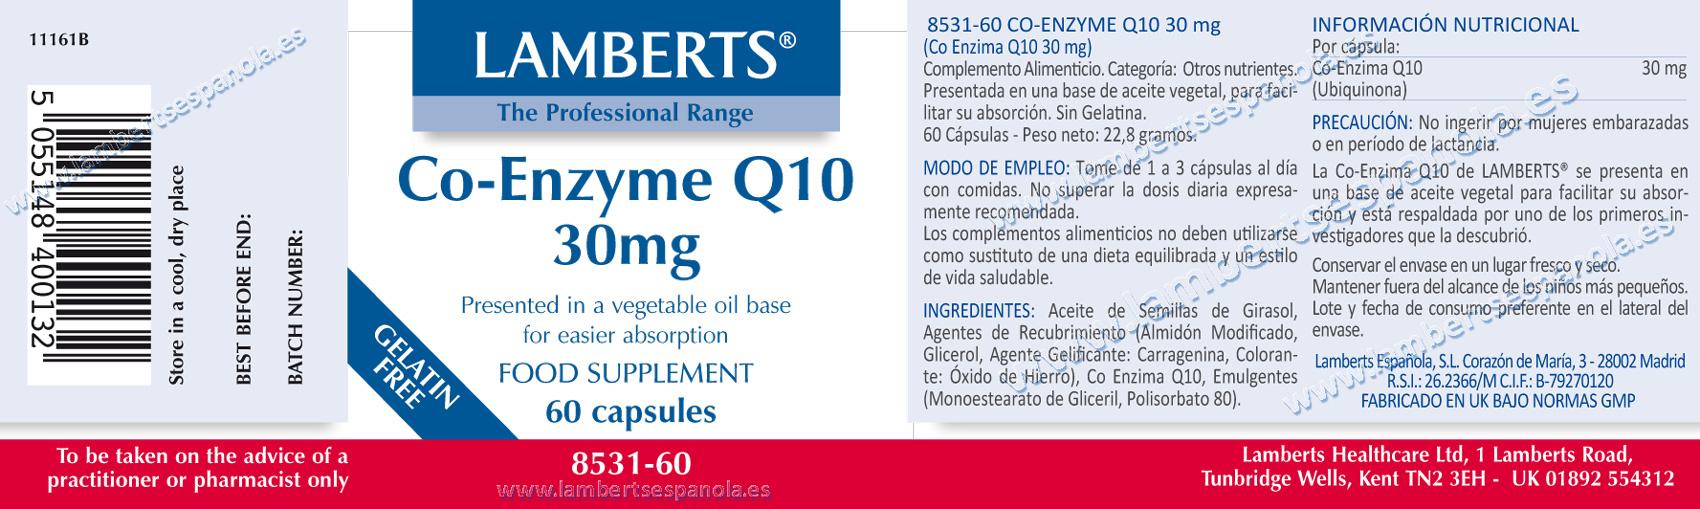 Coenzime Q10 30 mg